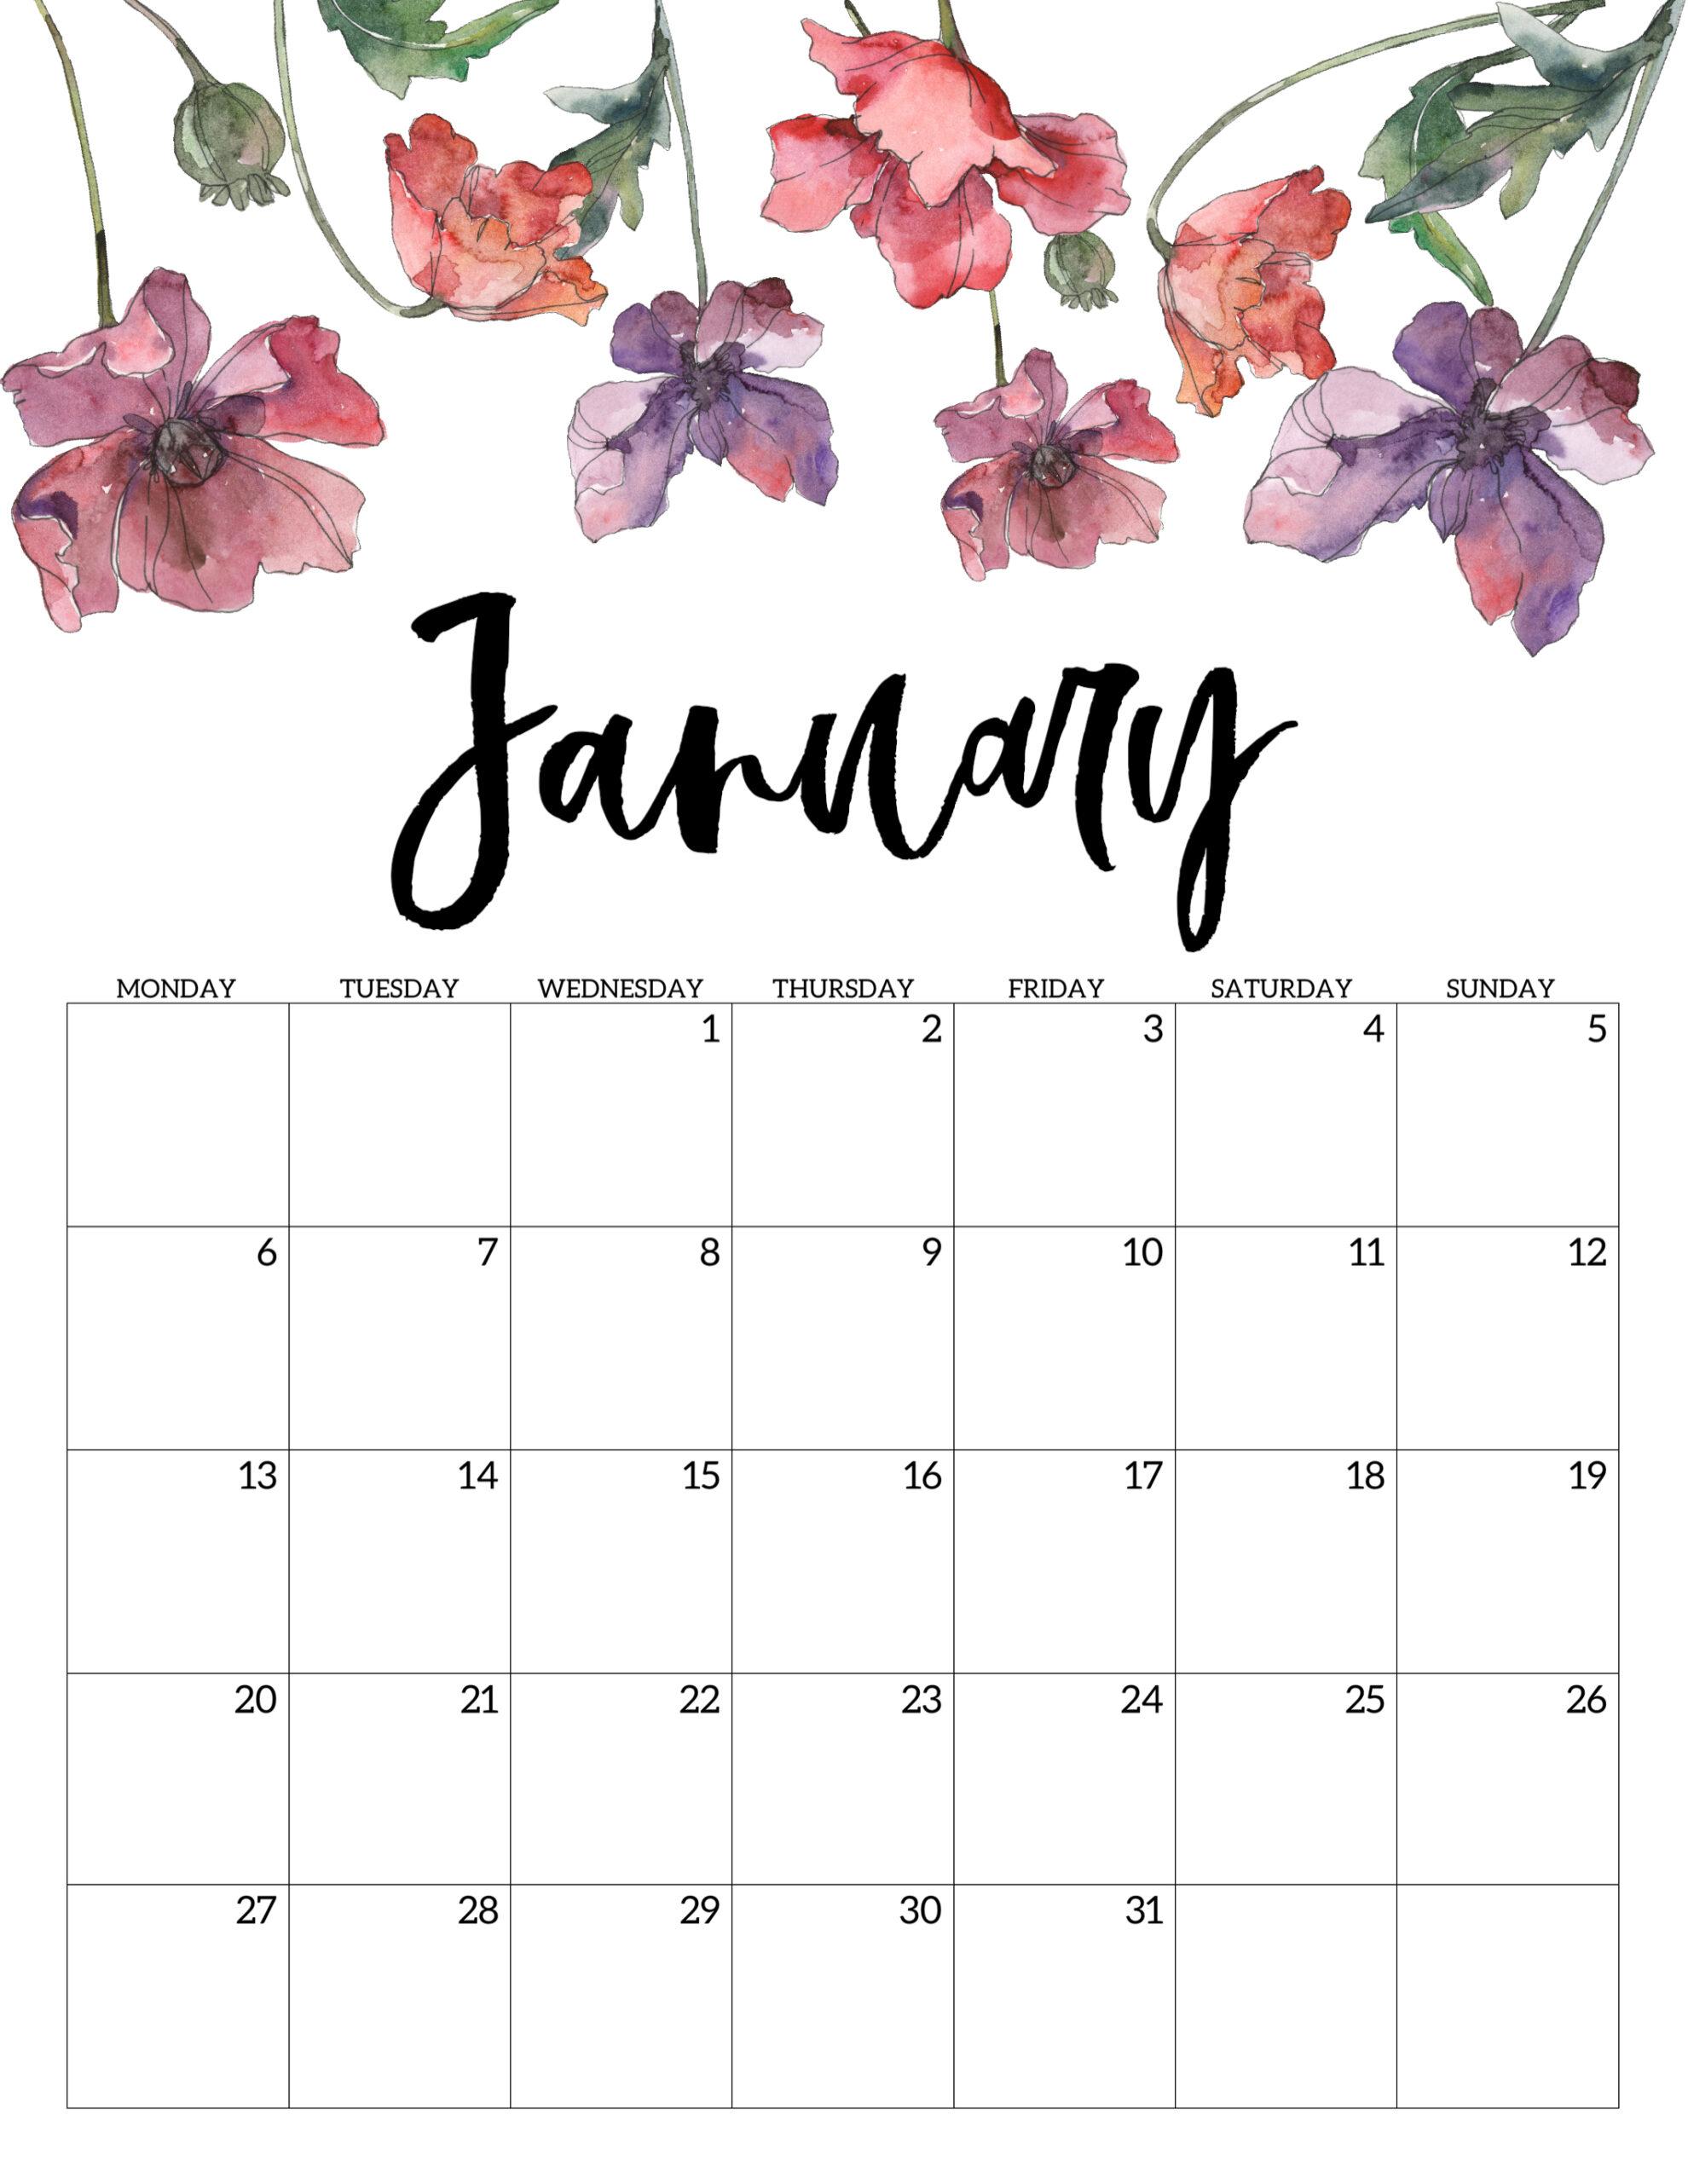 Free Printable 2020 Monday Start Calendar {Floral}  Paper in January 2020 Calendar Starting Monday